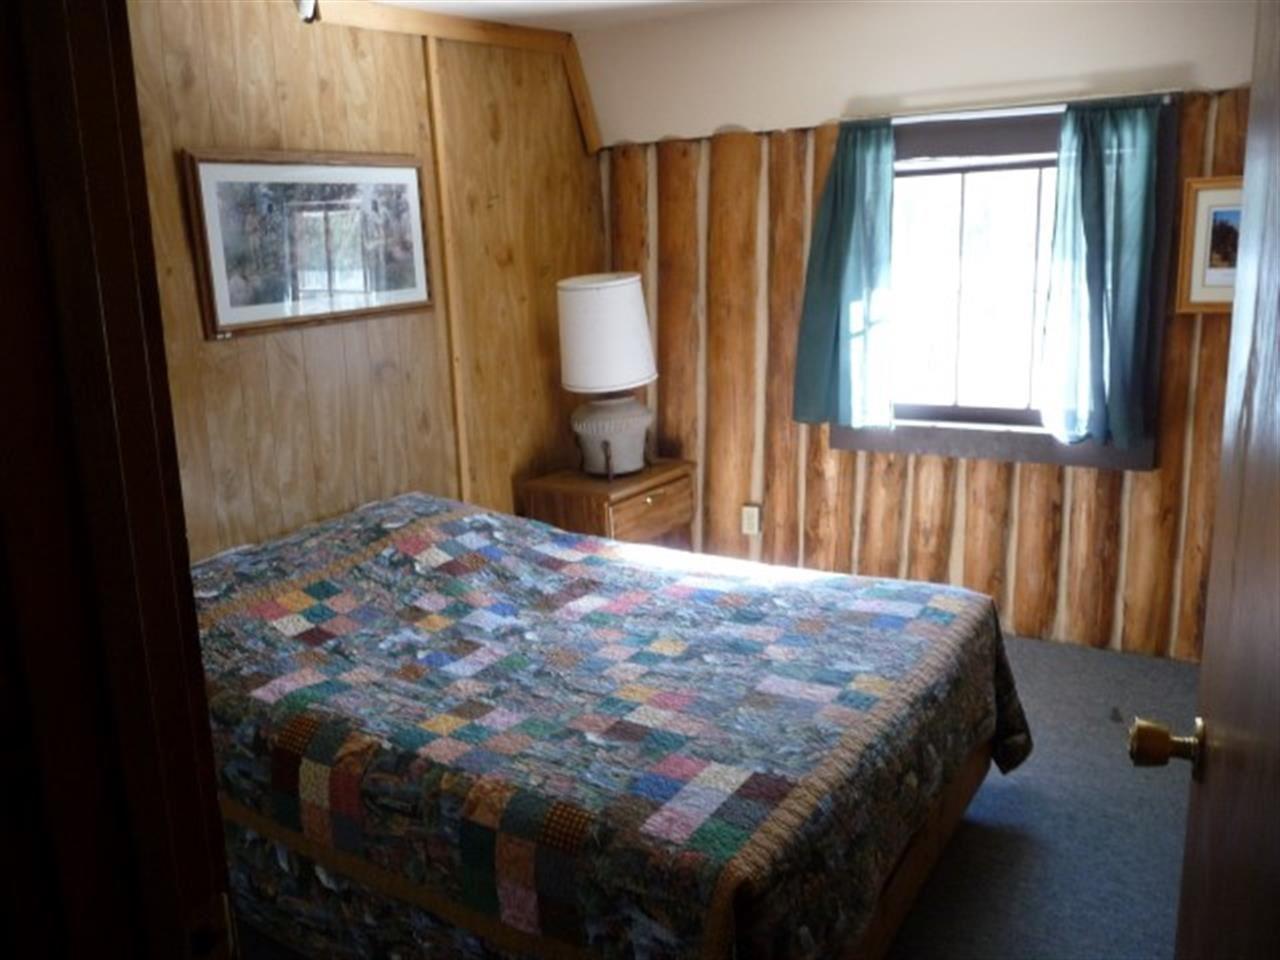 Montana beaverhead county polaris - Montana Beaverhead County Polaris 59